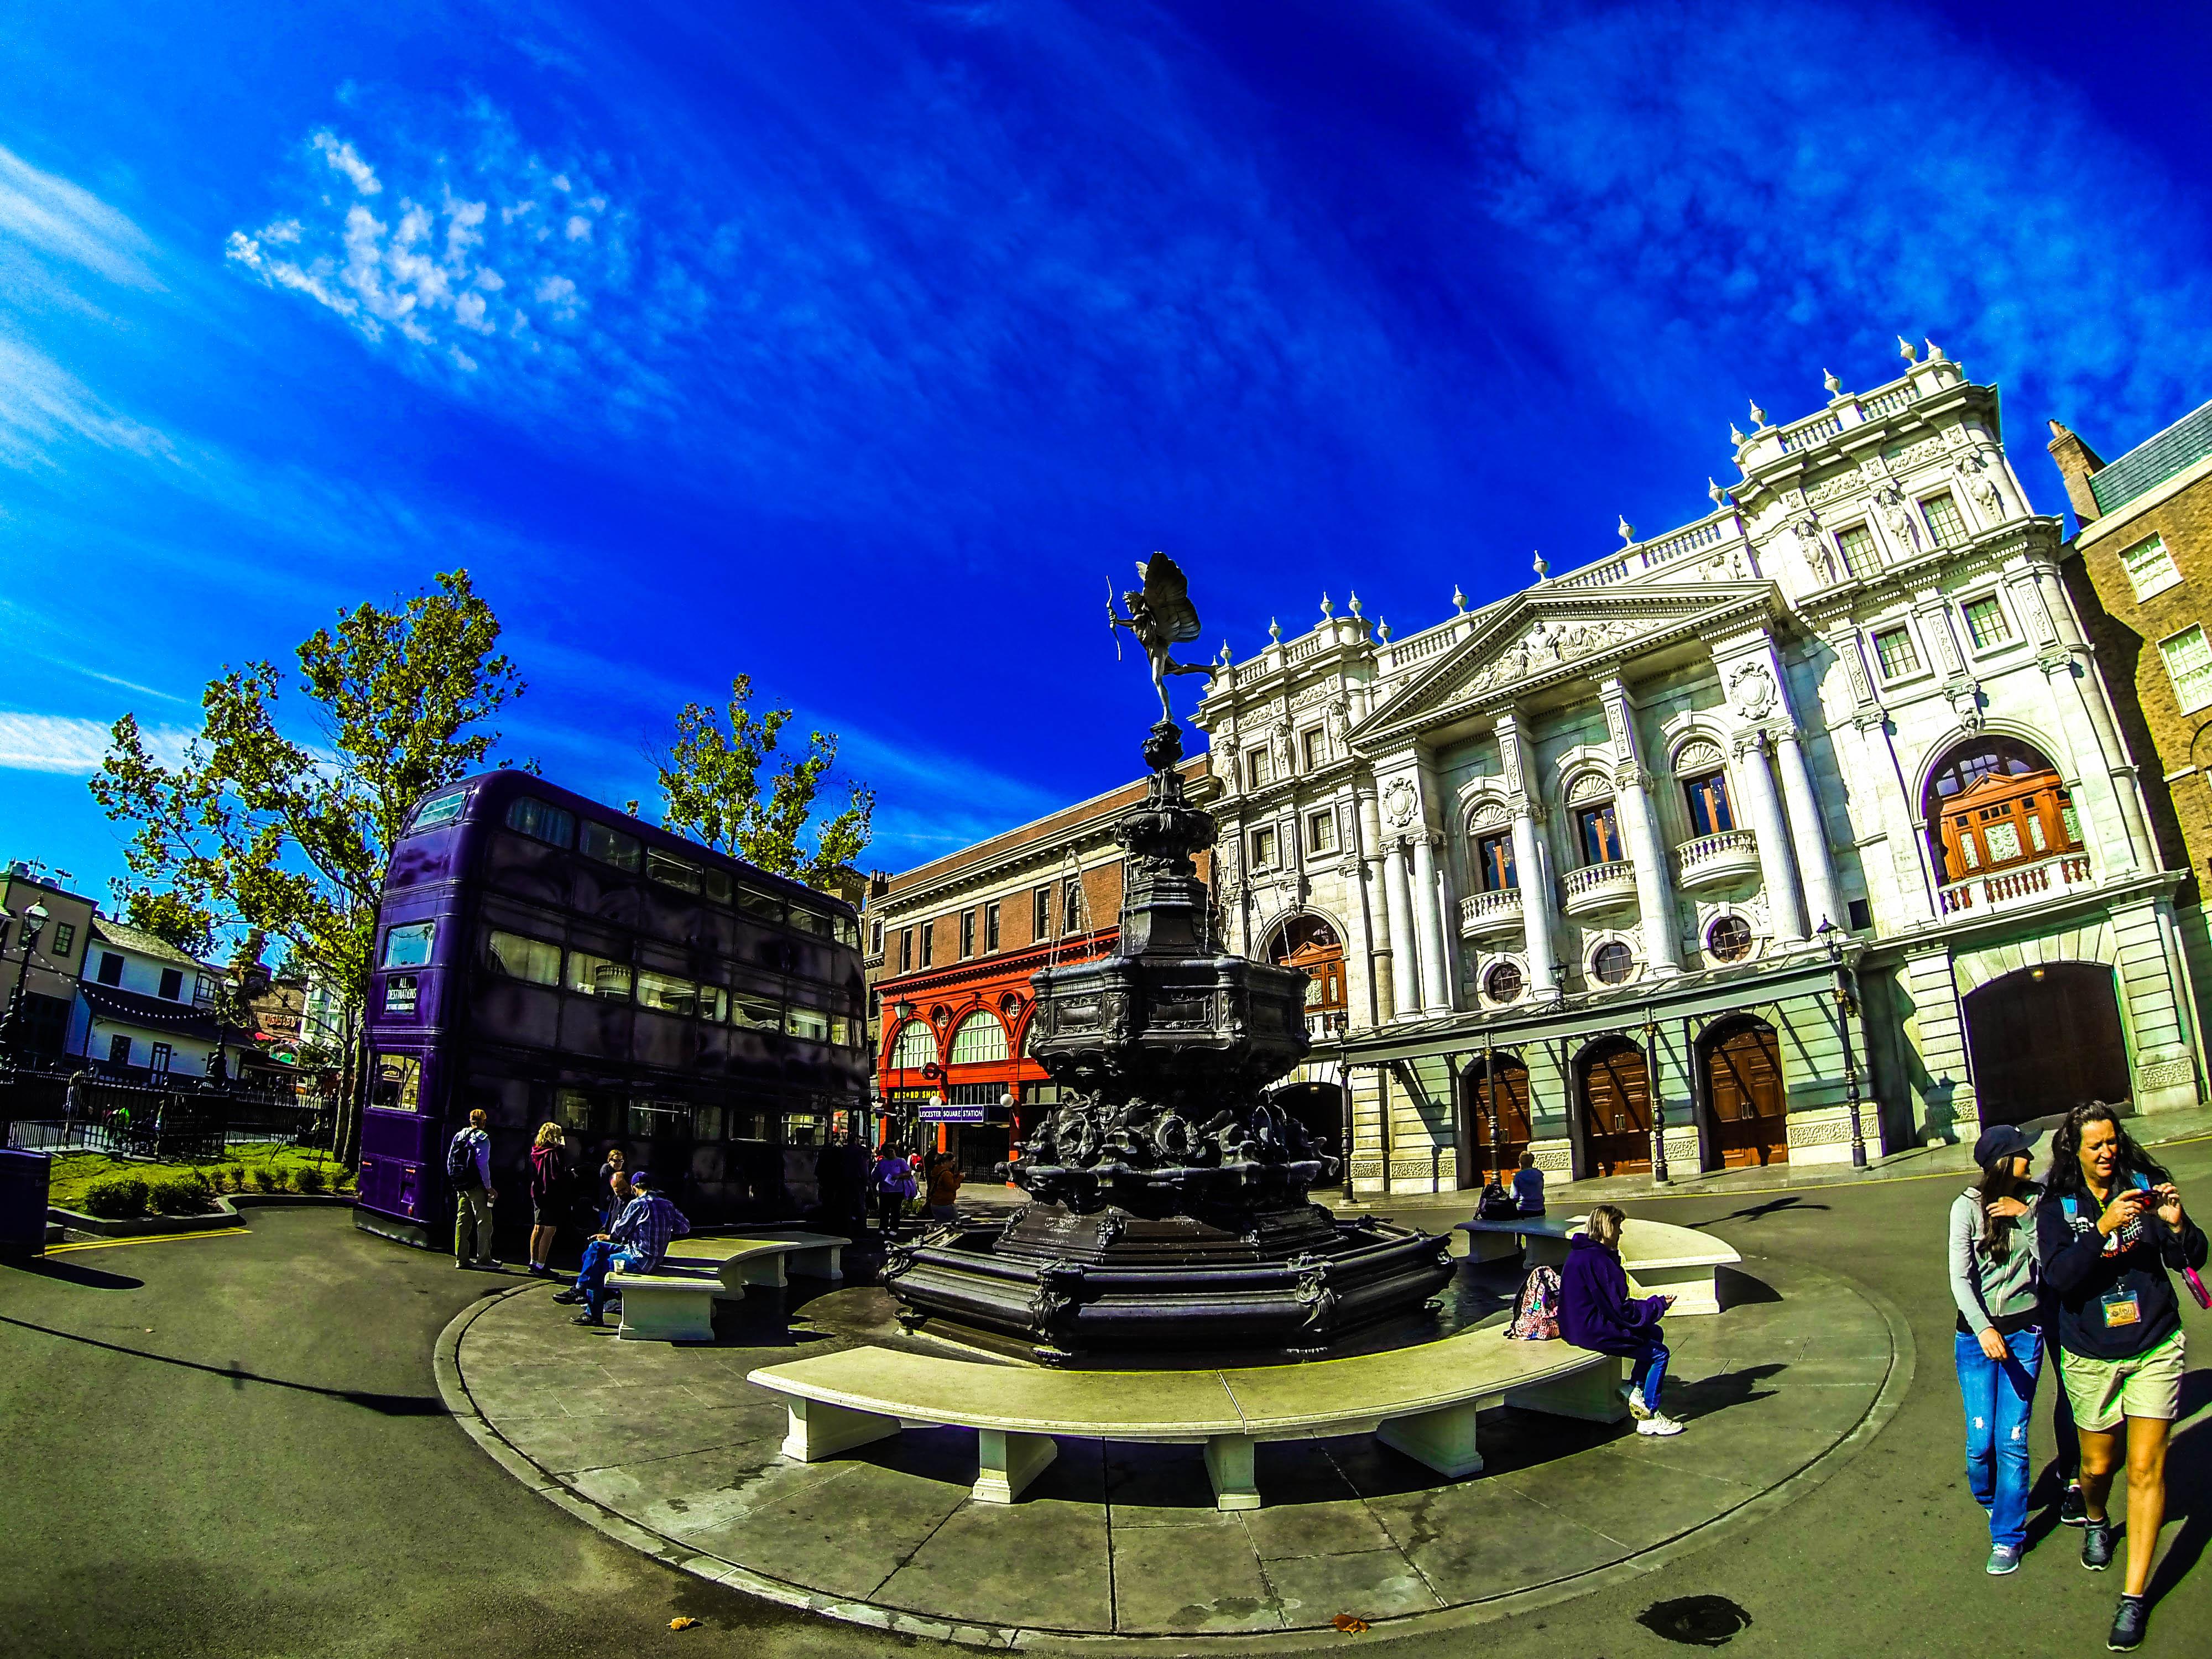 Good Wallpaper Harry Potter Square - England-bus-cross-Harry-potter-Bank-double-kings-decker-Gringotts-GoPro-957170  Pictures_465547.jpg